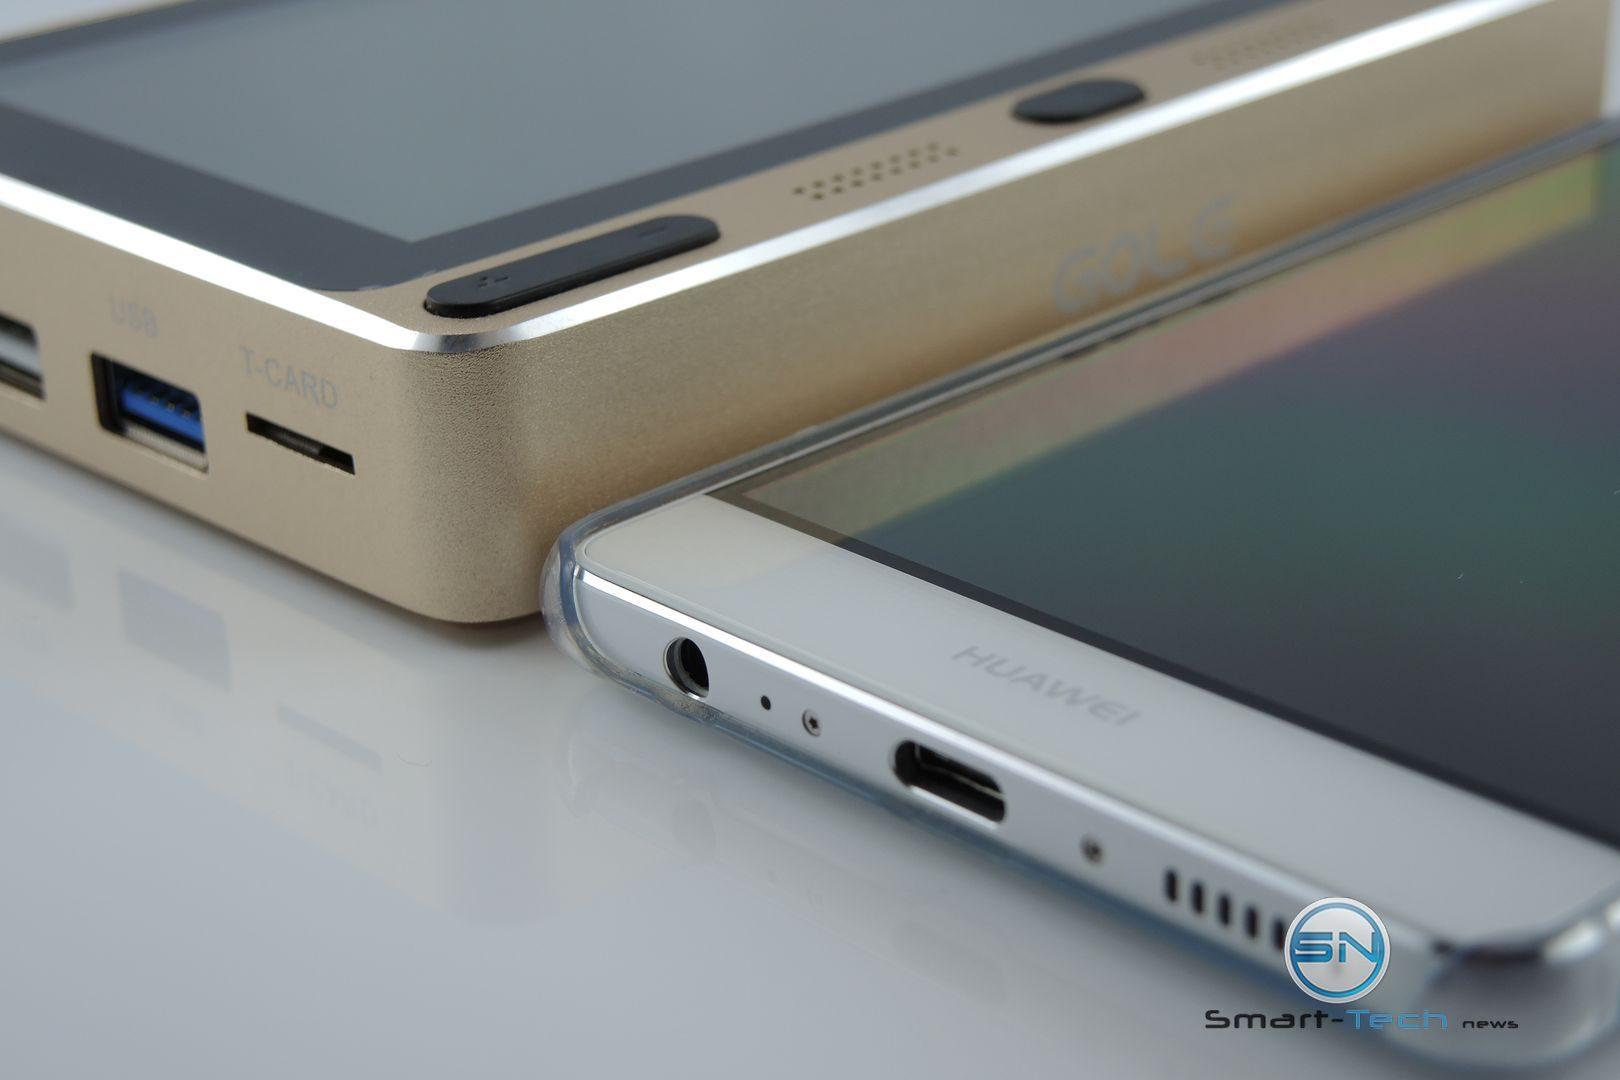 groessenvergleich-gole1-vs-huawei-p9-plus-smarttechnews